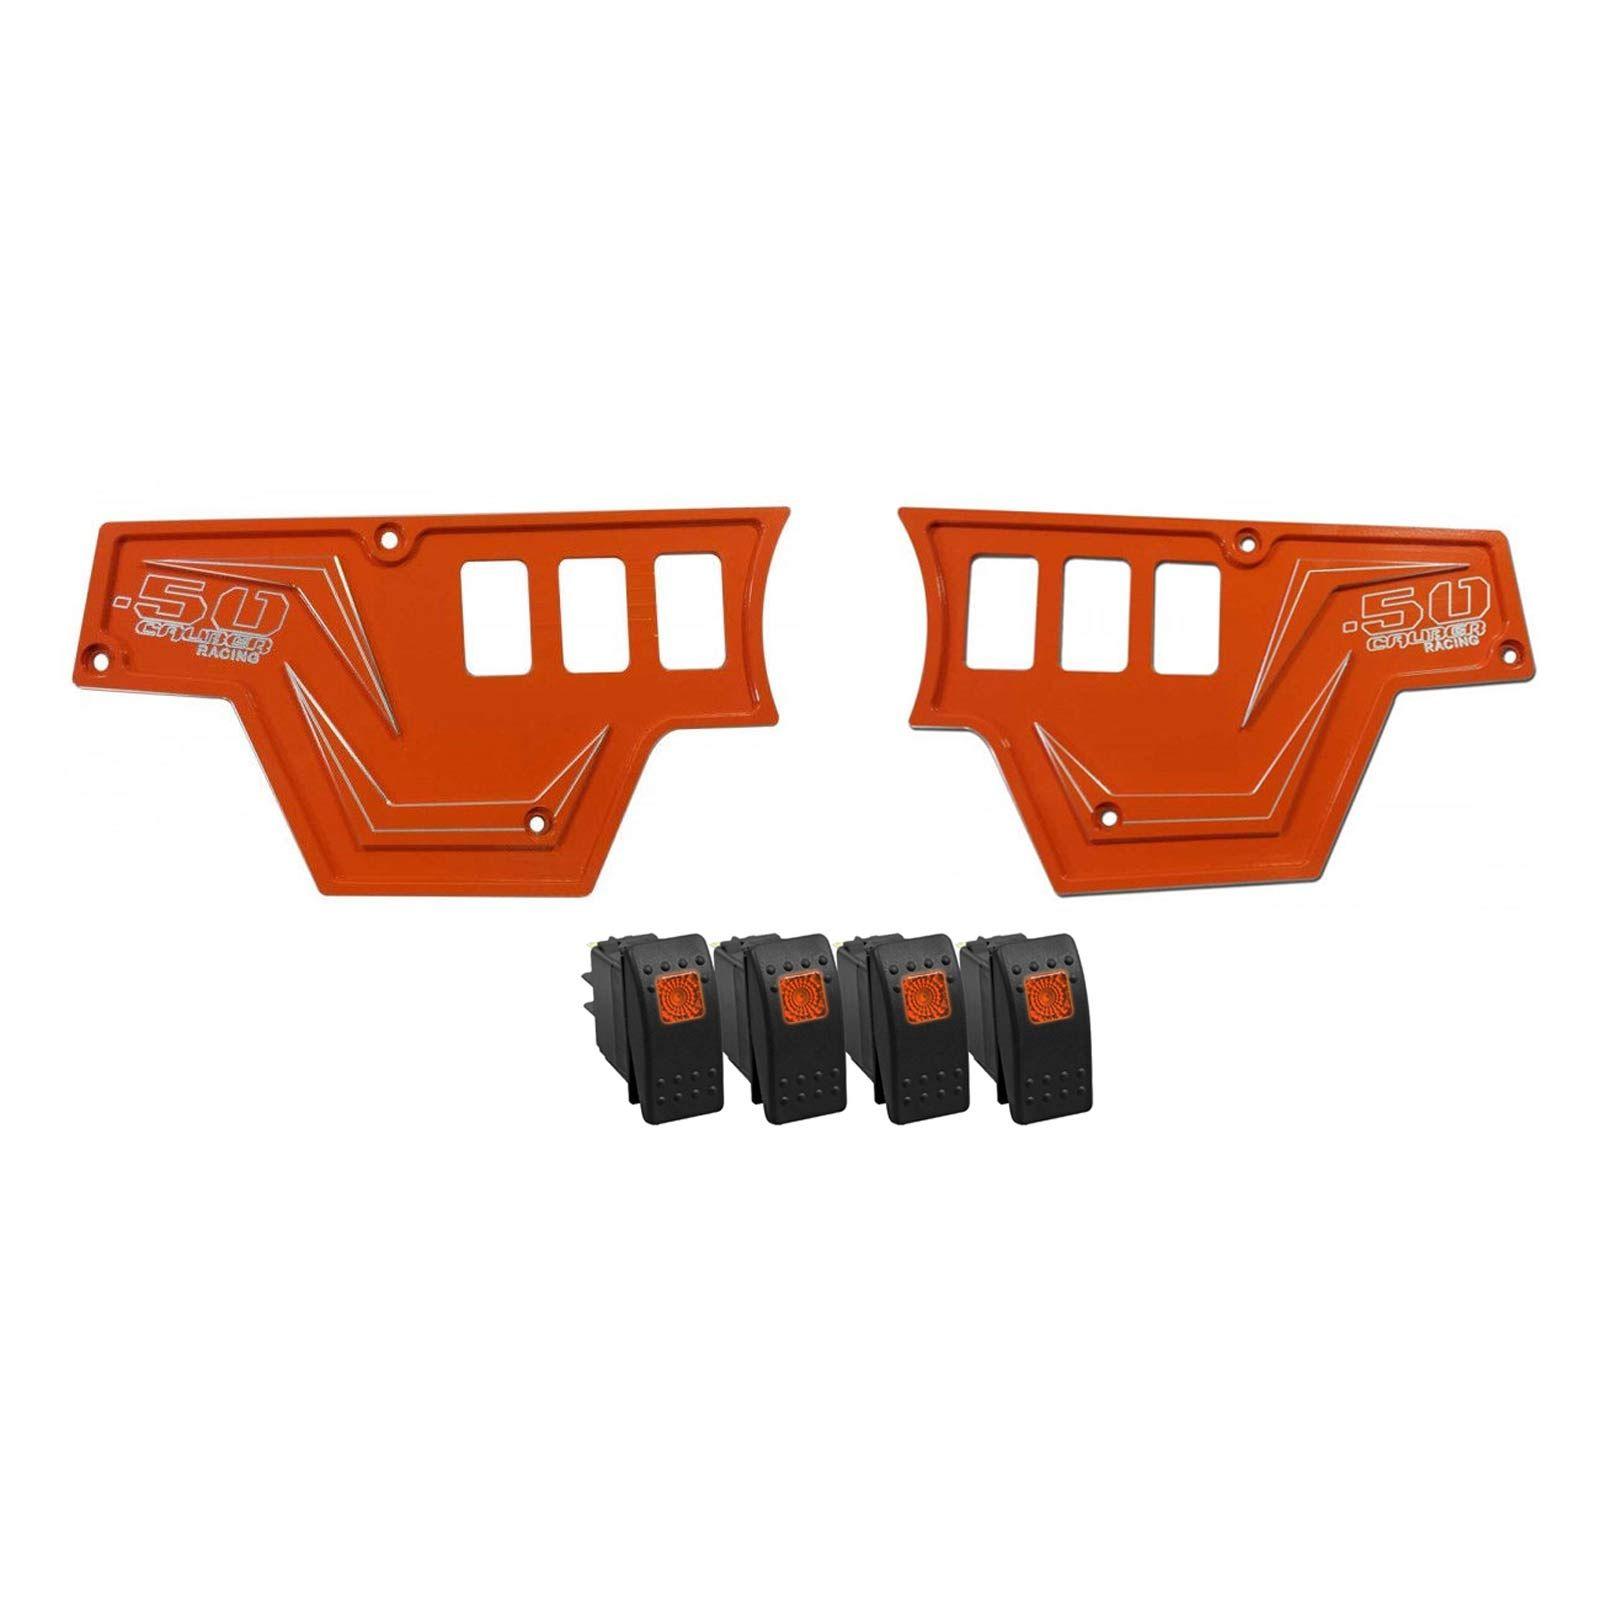 Orange Polaris RZR XP 1000 Left Side 3 Switch Dash Panel 50 Caliber Racing CNC